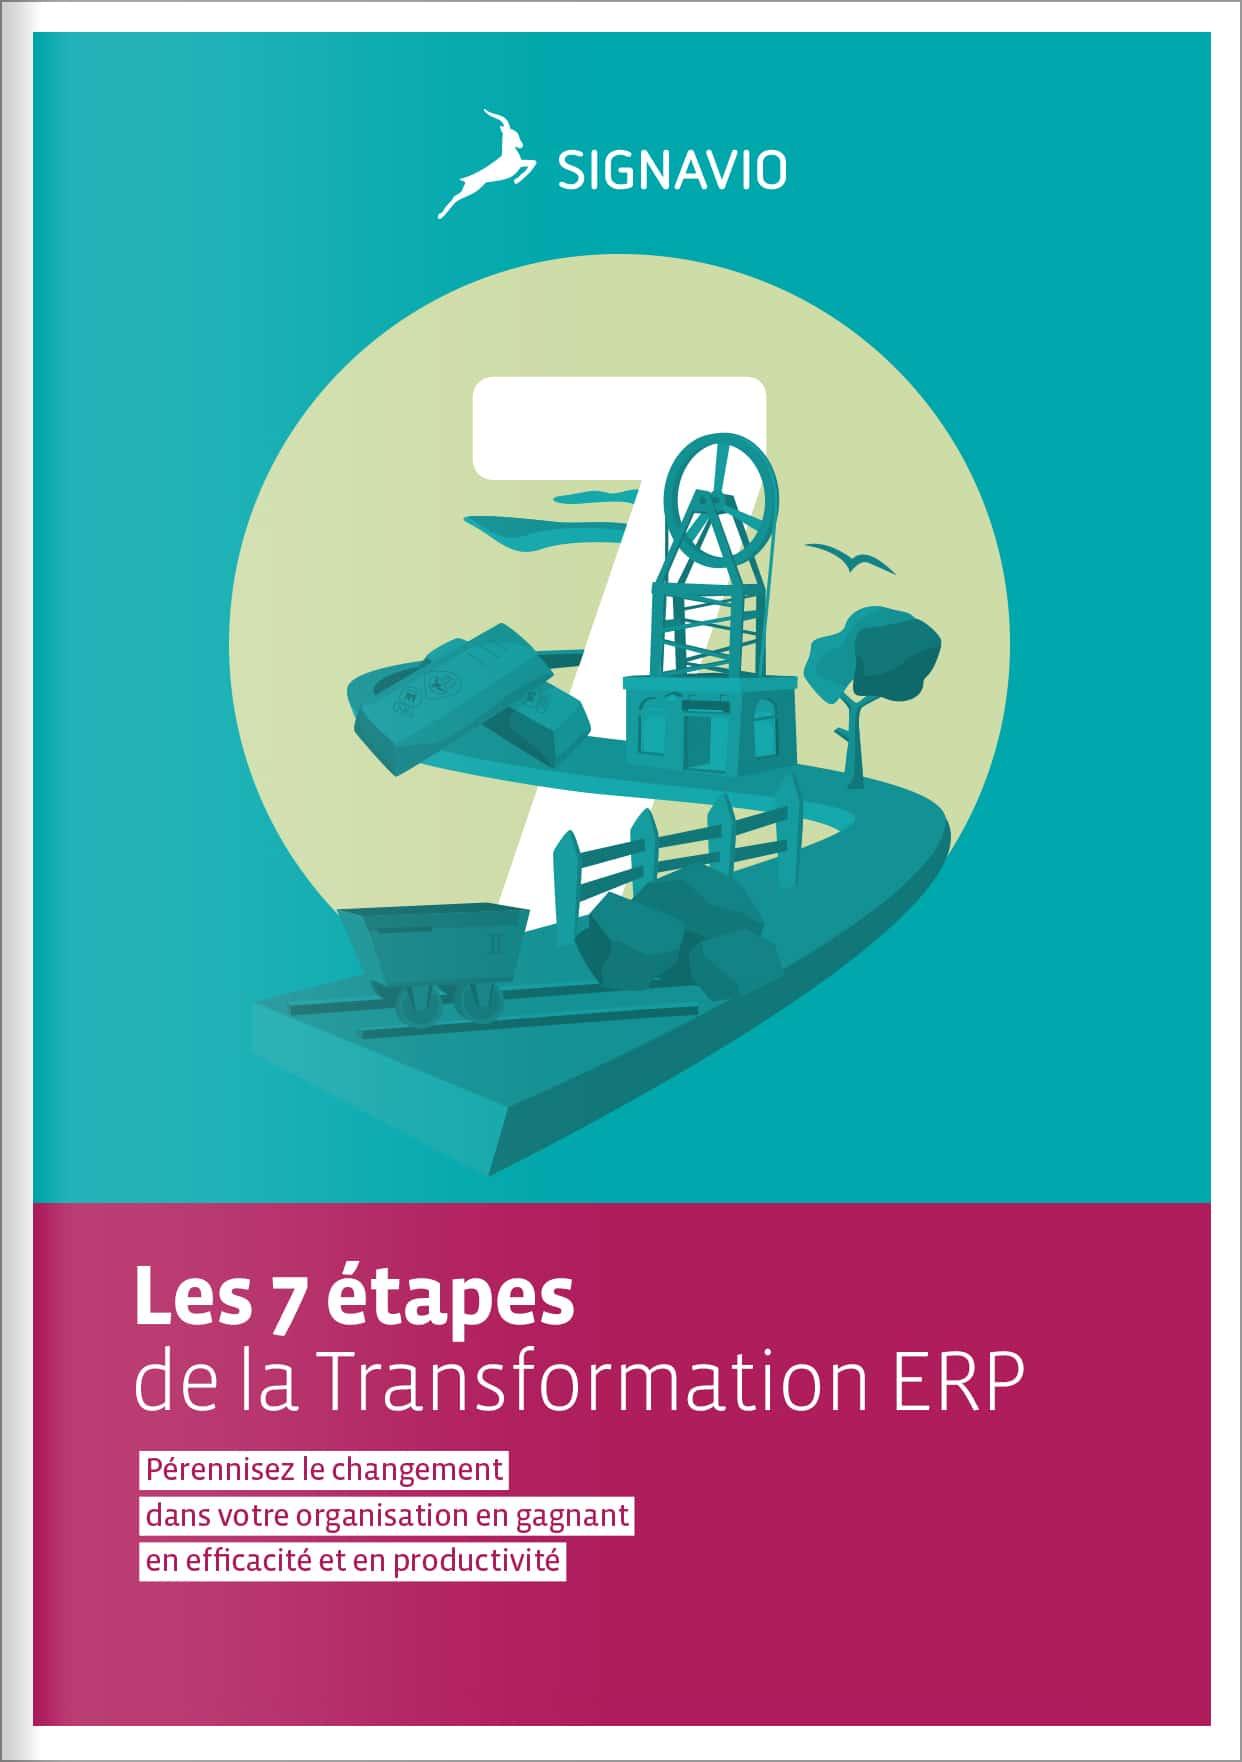 7steps-erp-transformation